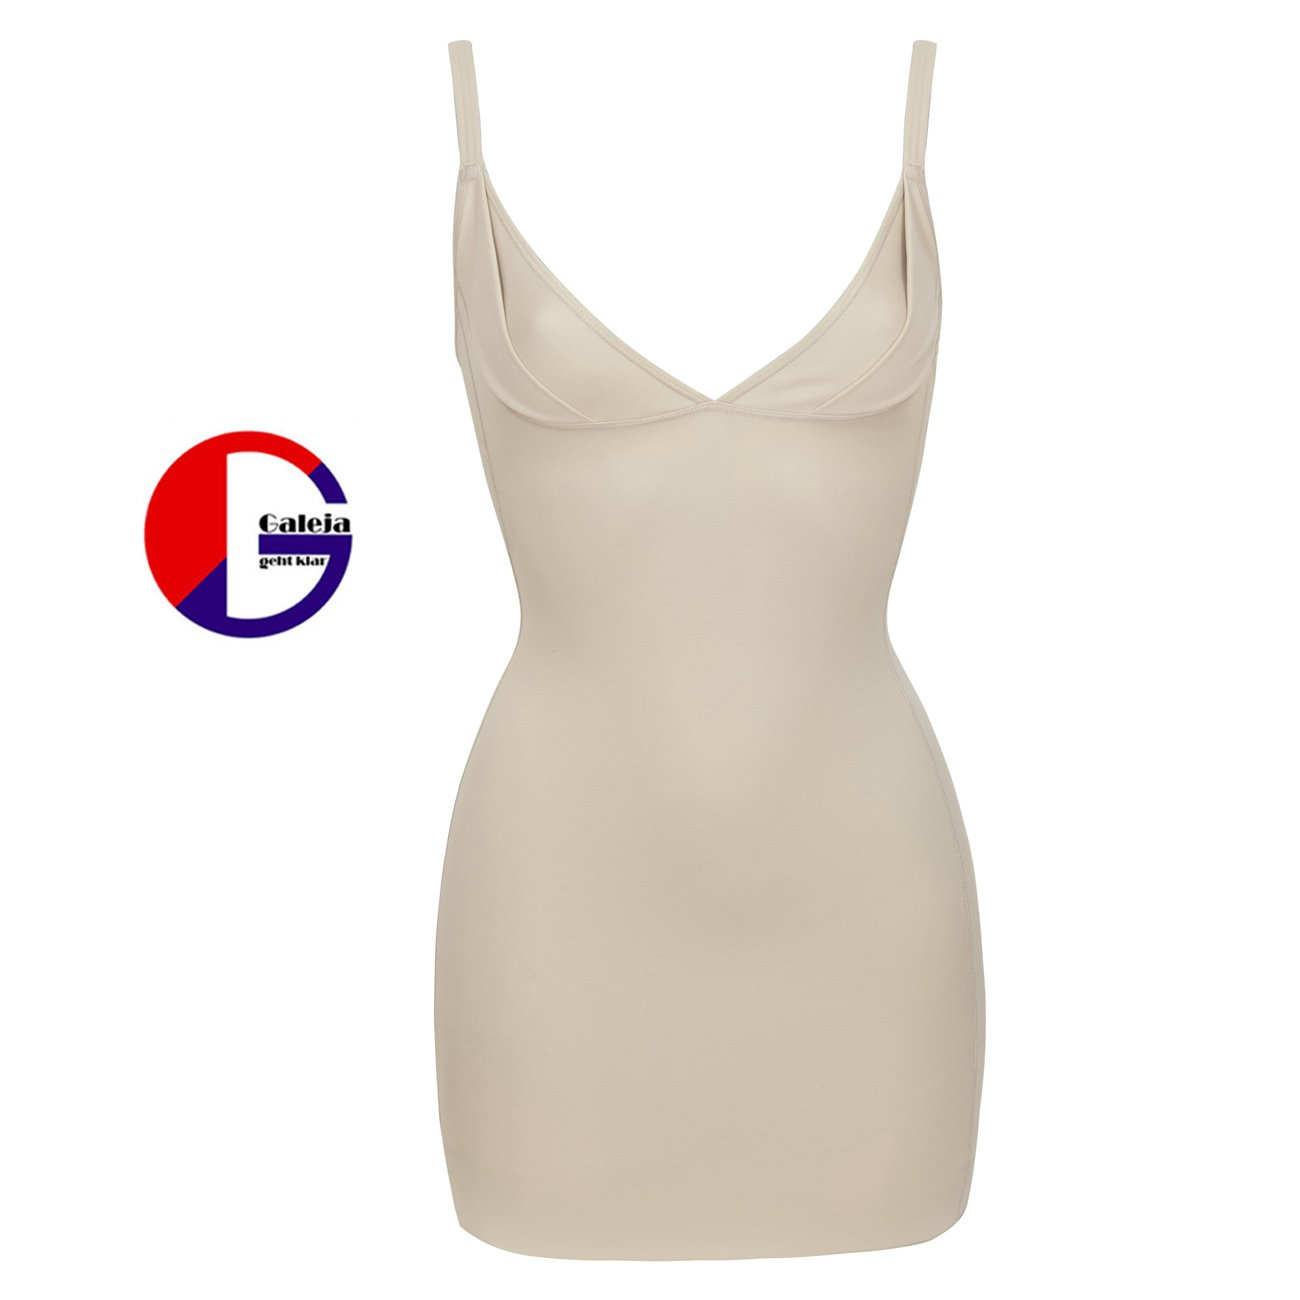 Südtrikot Cybele Miederkleid Push up Figurformendes Kleid Shapewear 2 Farben 7 Gr. 36/S - 48/4XL 14390